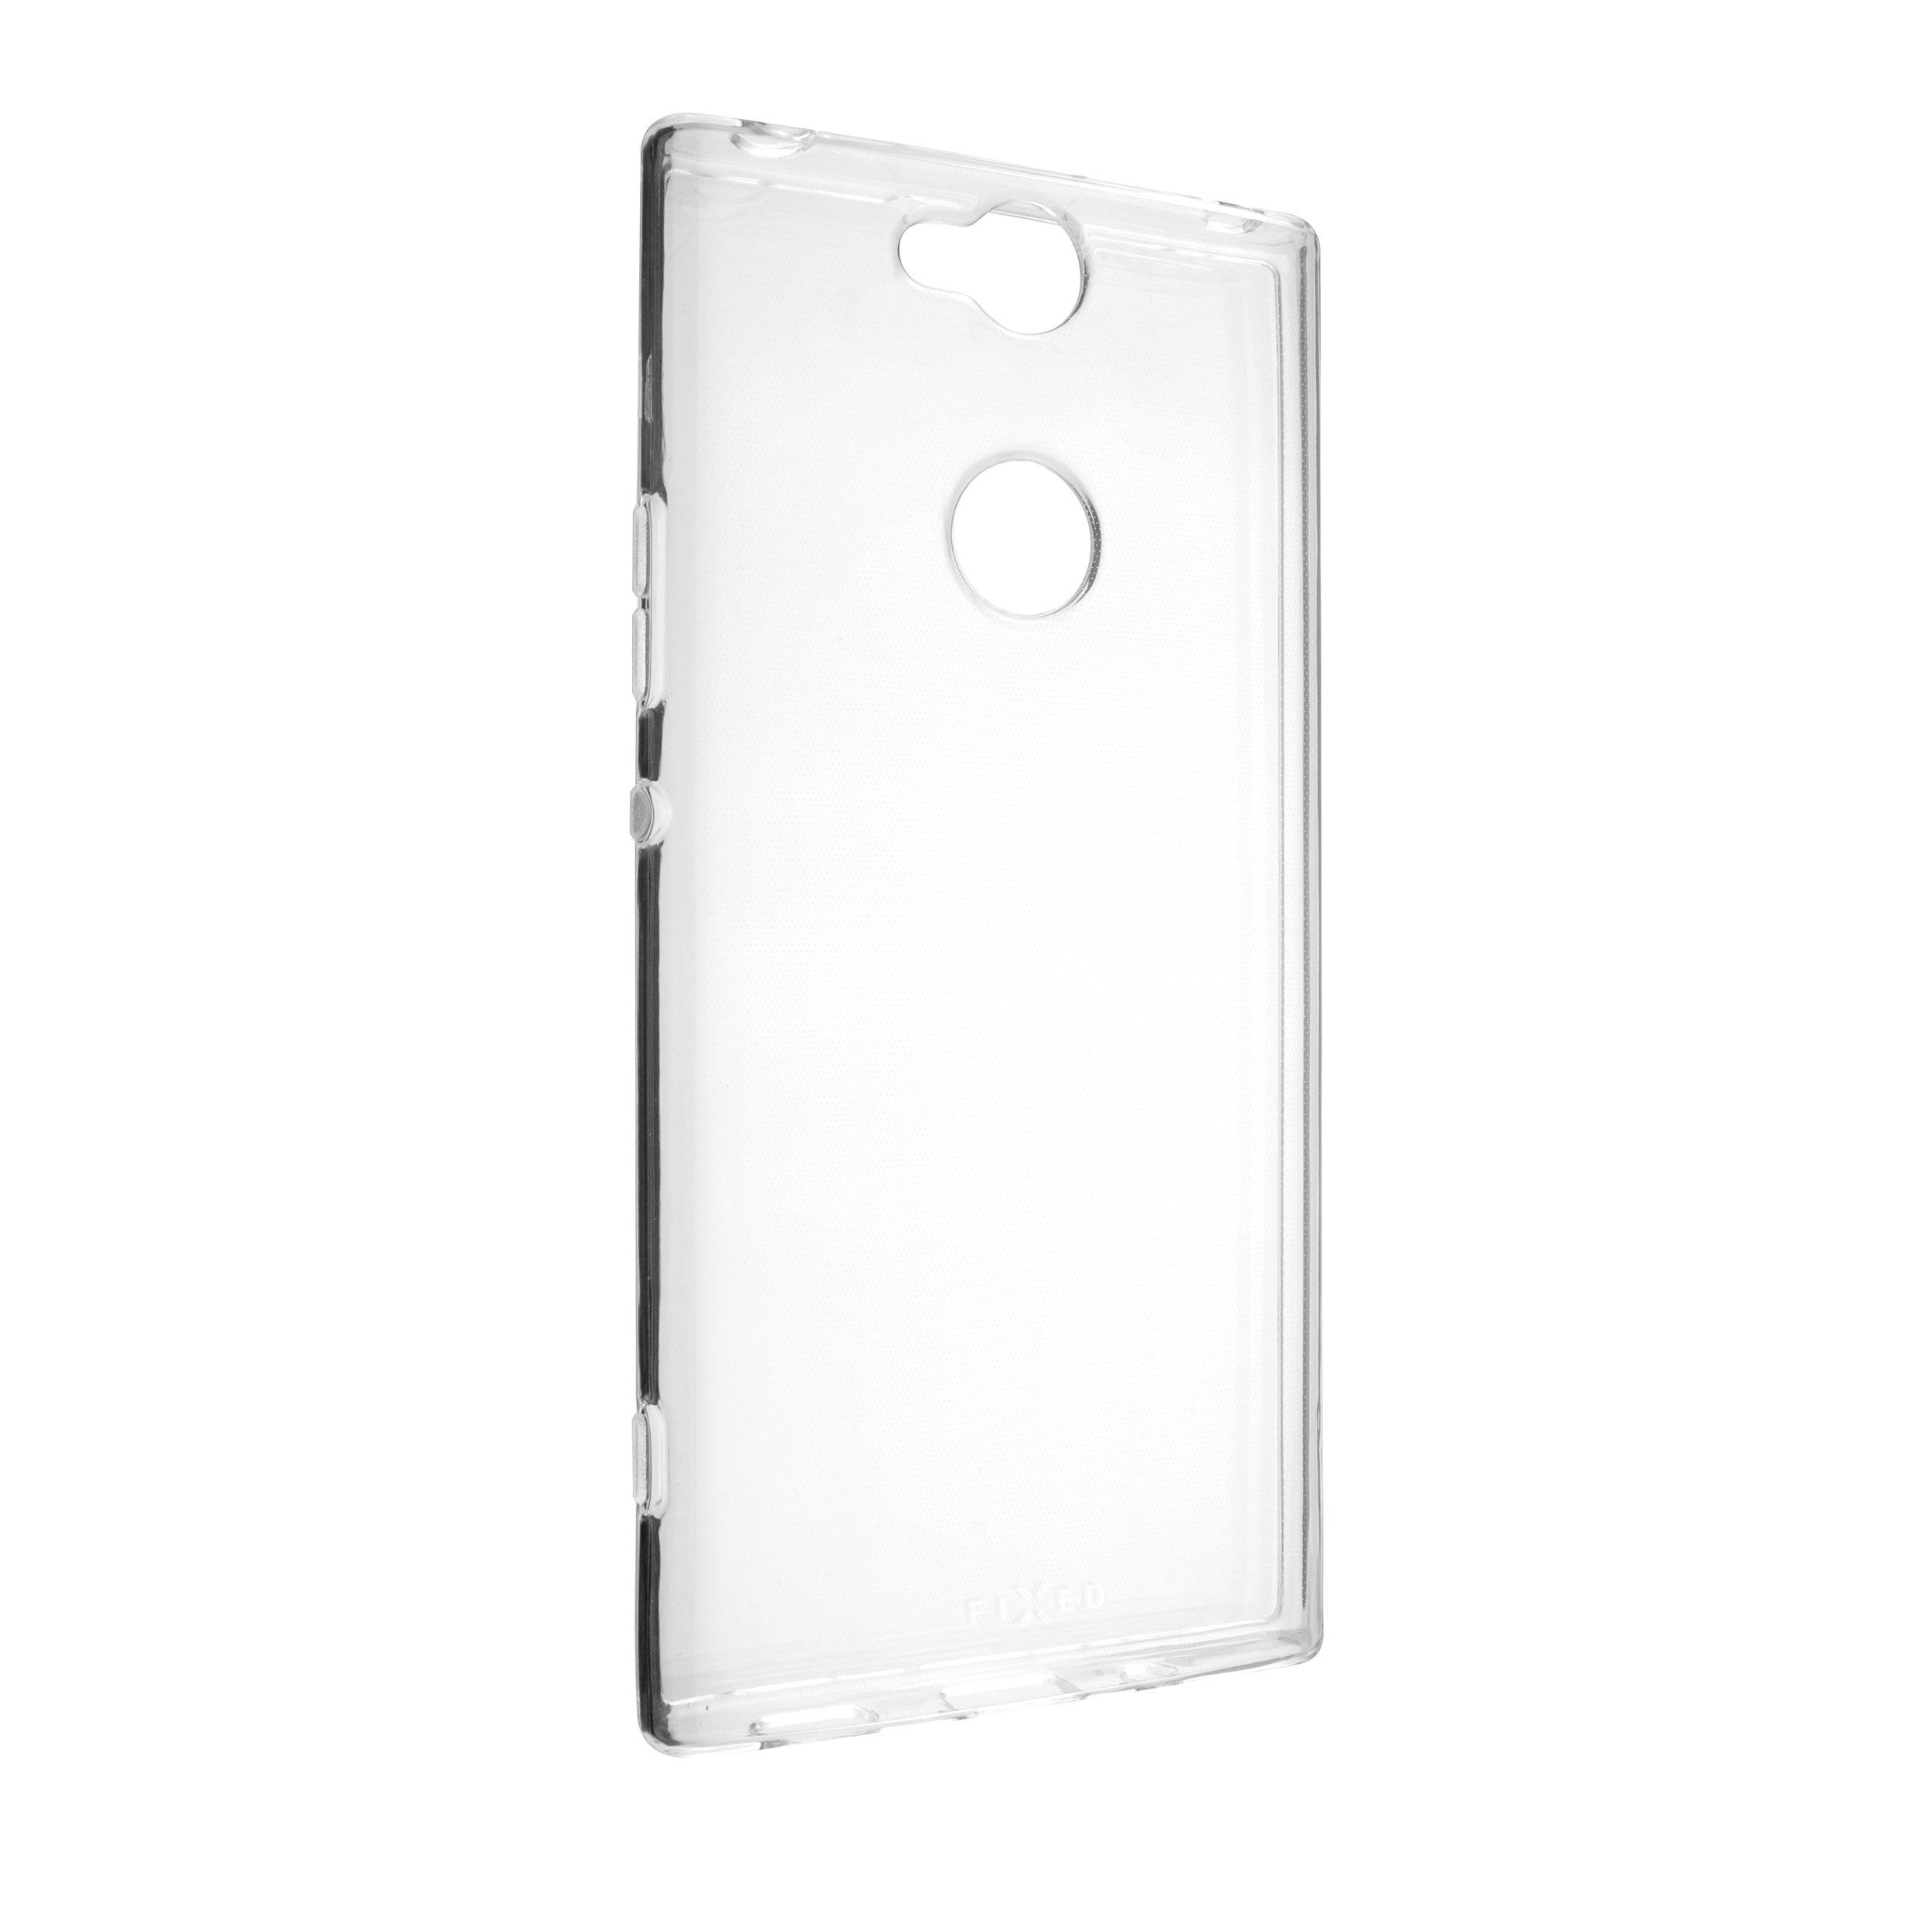 Ultratenké TPU gelové pouzdro FIXED Skin pro Sony Xperia XA2 Plus, 0,6 mm, čiré